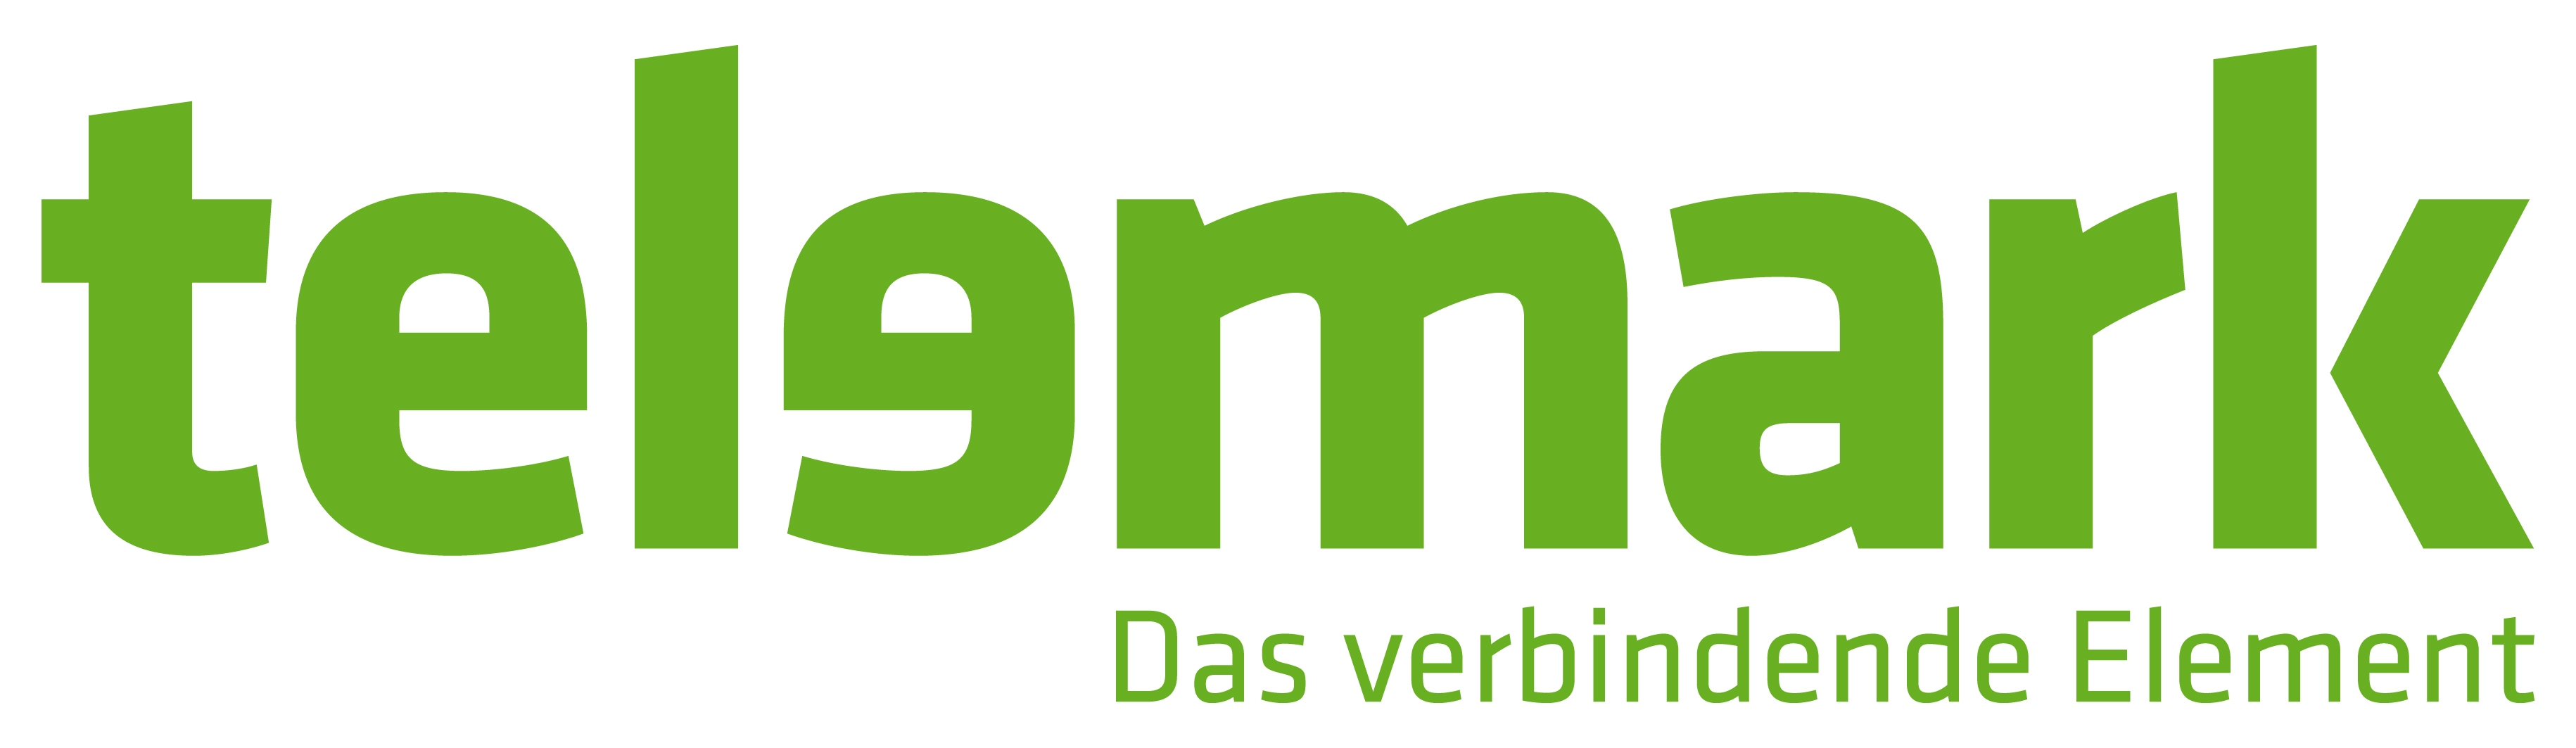 Logo Telemark Telekommunikationsgesellschaft Mark mbH